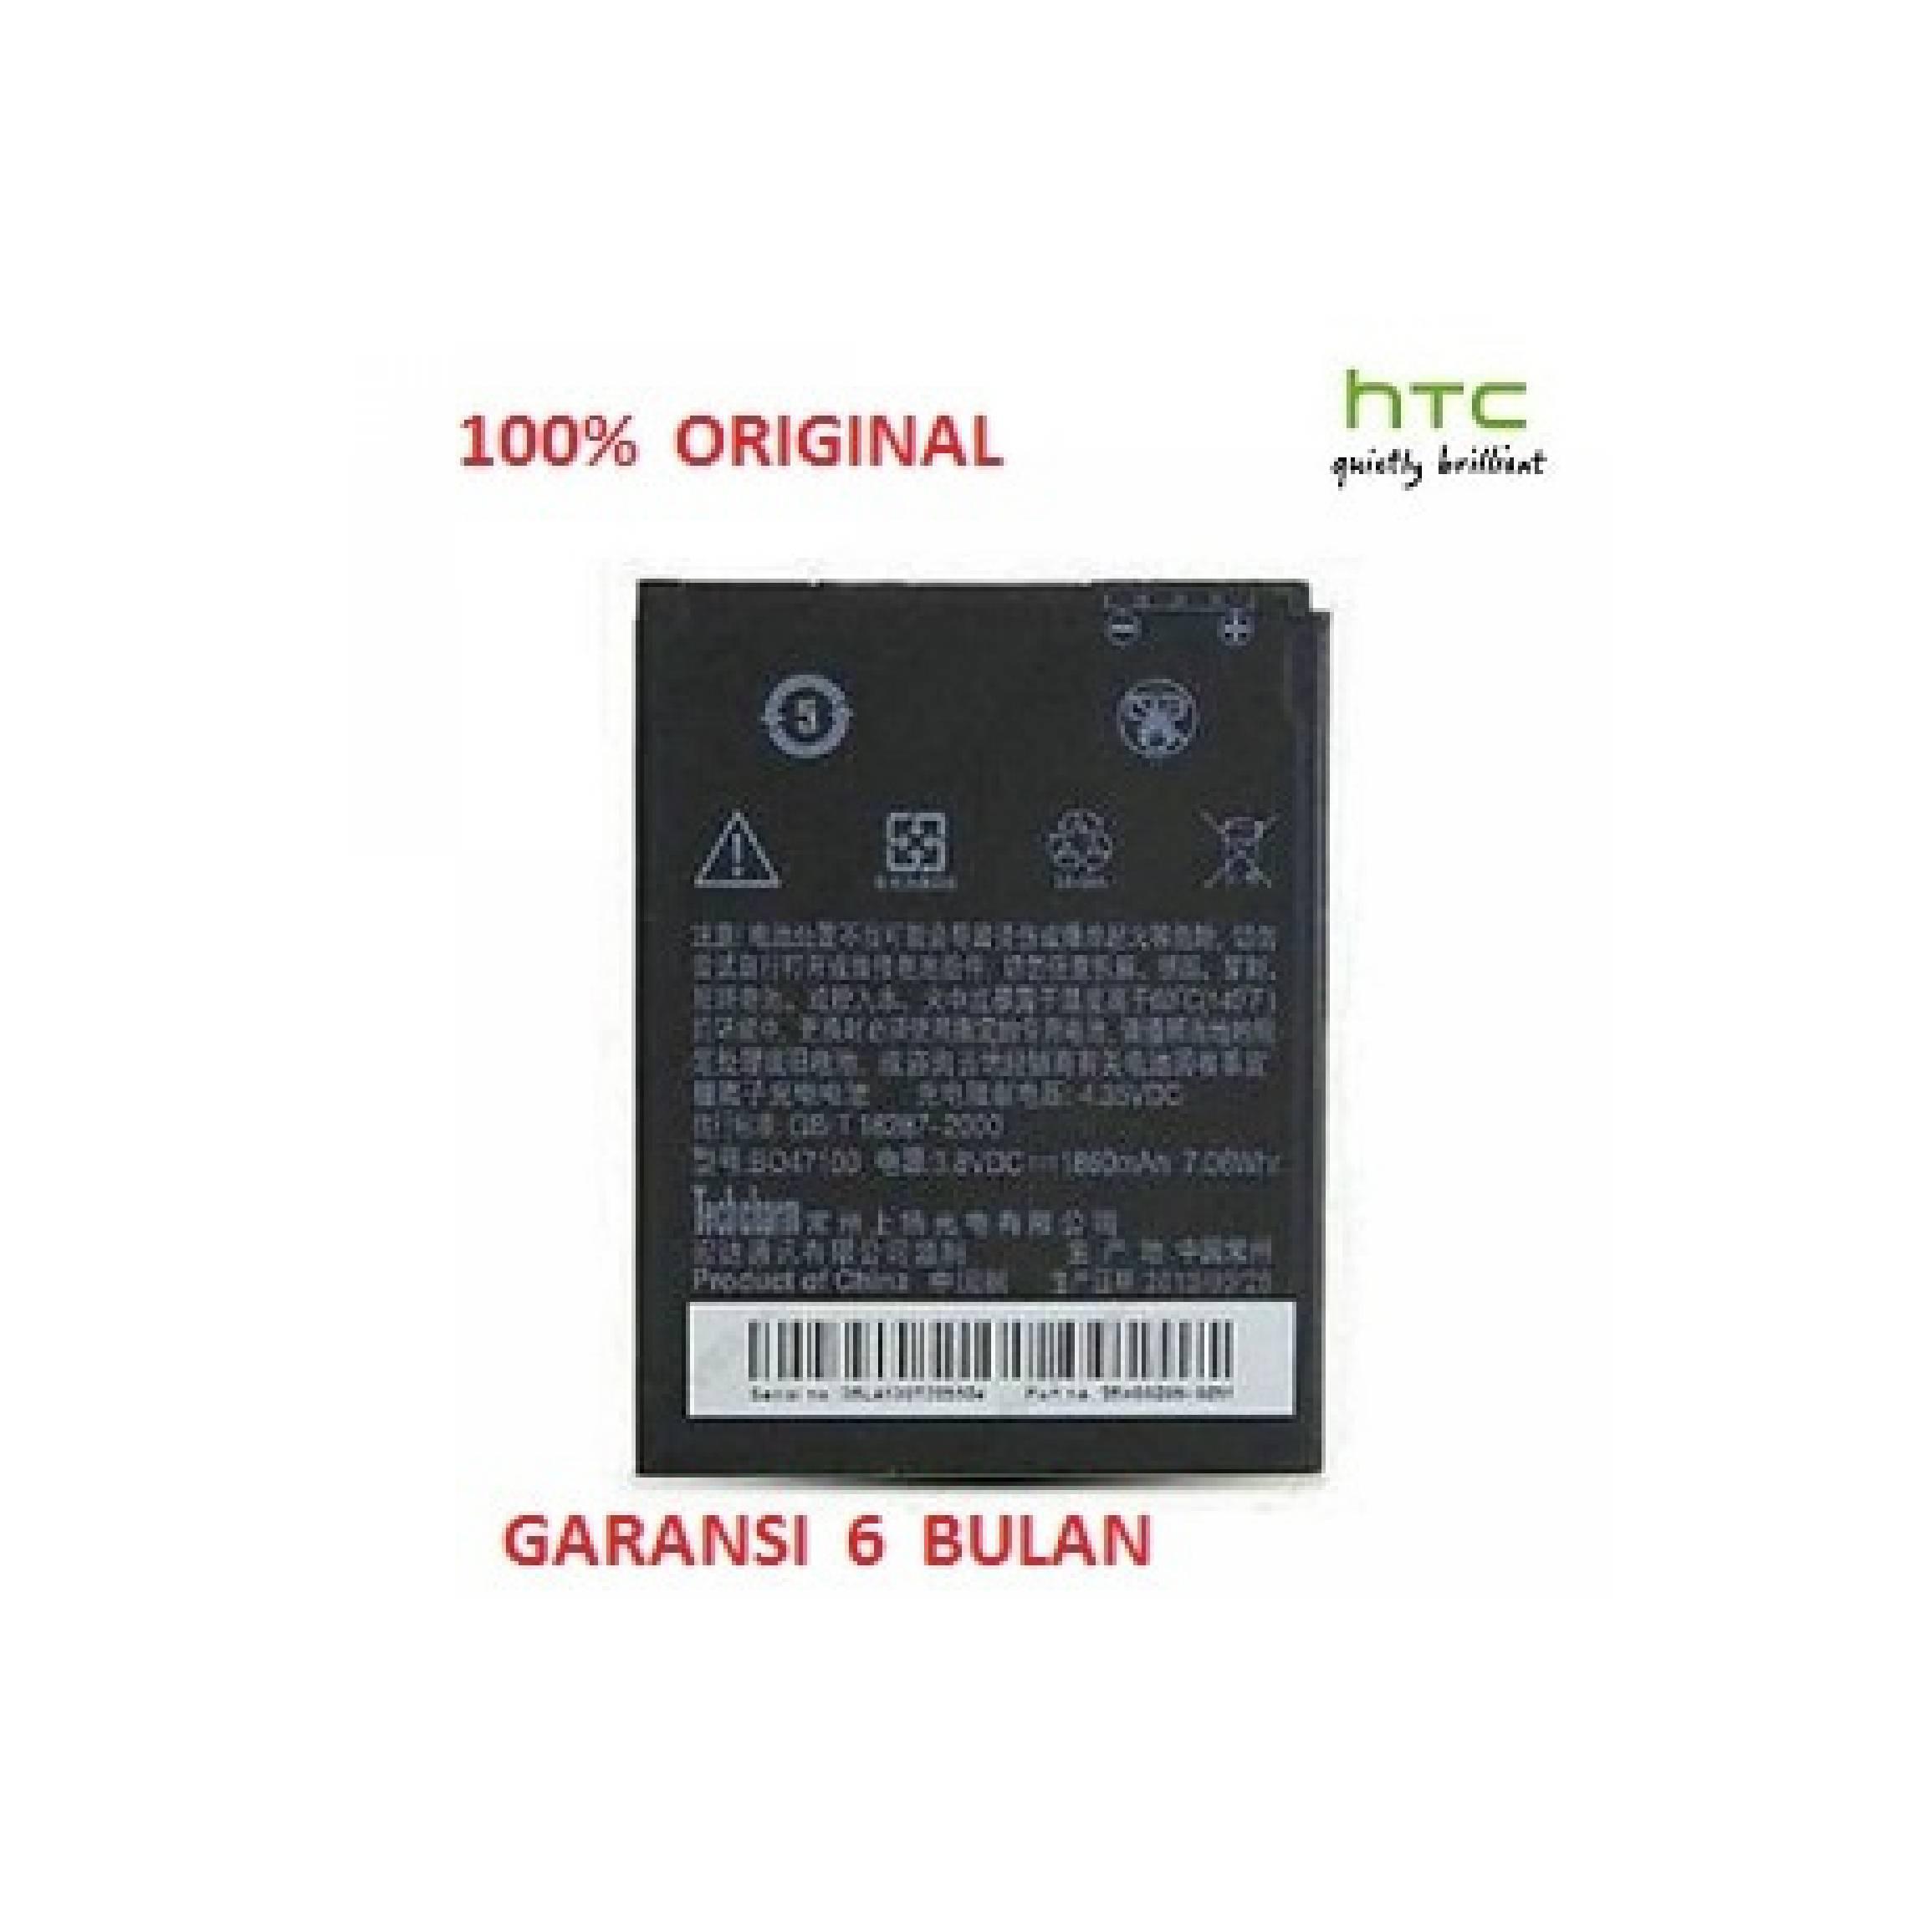 100% ORIGINAL HTC Battery Bo47100 / Desire 600 Dual Sim